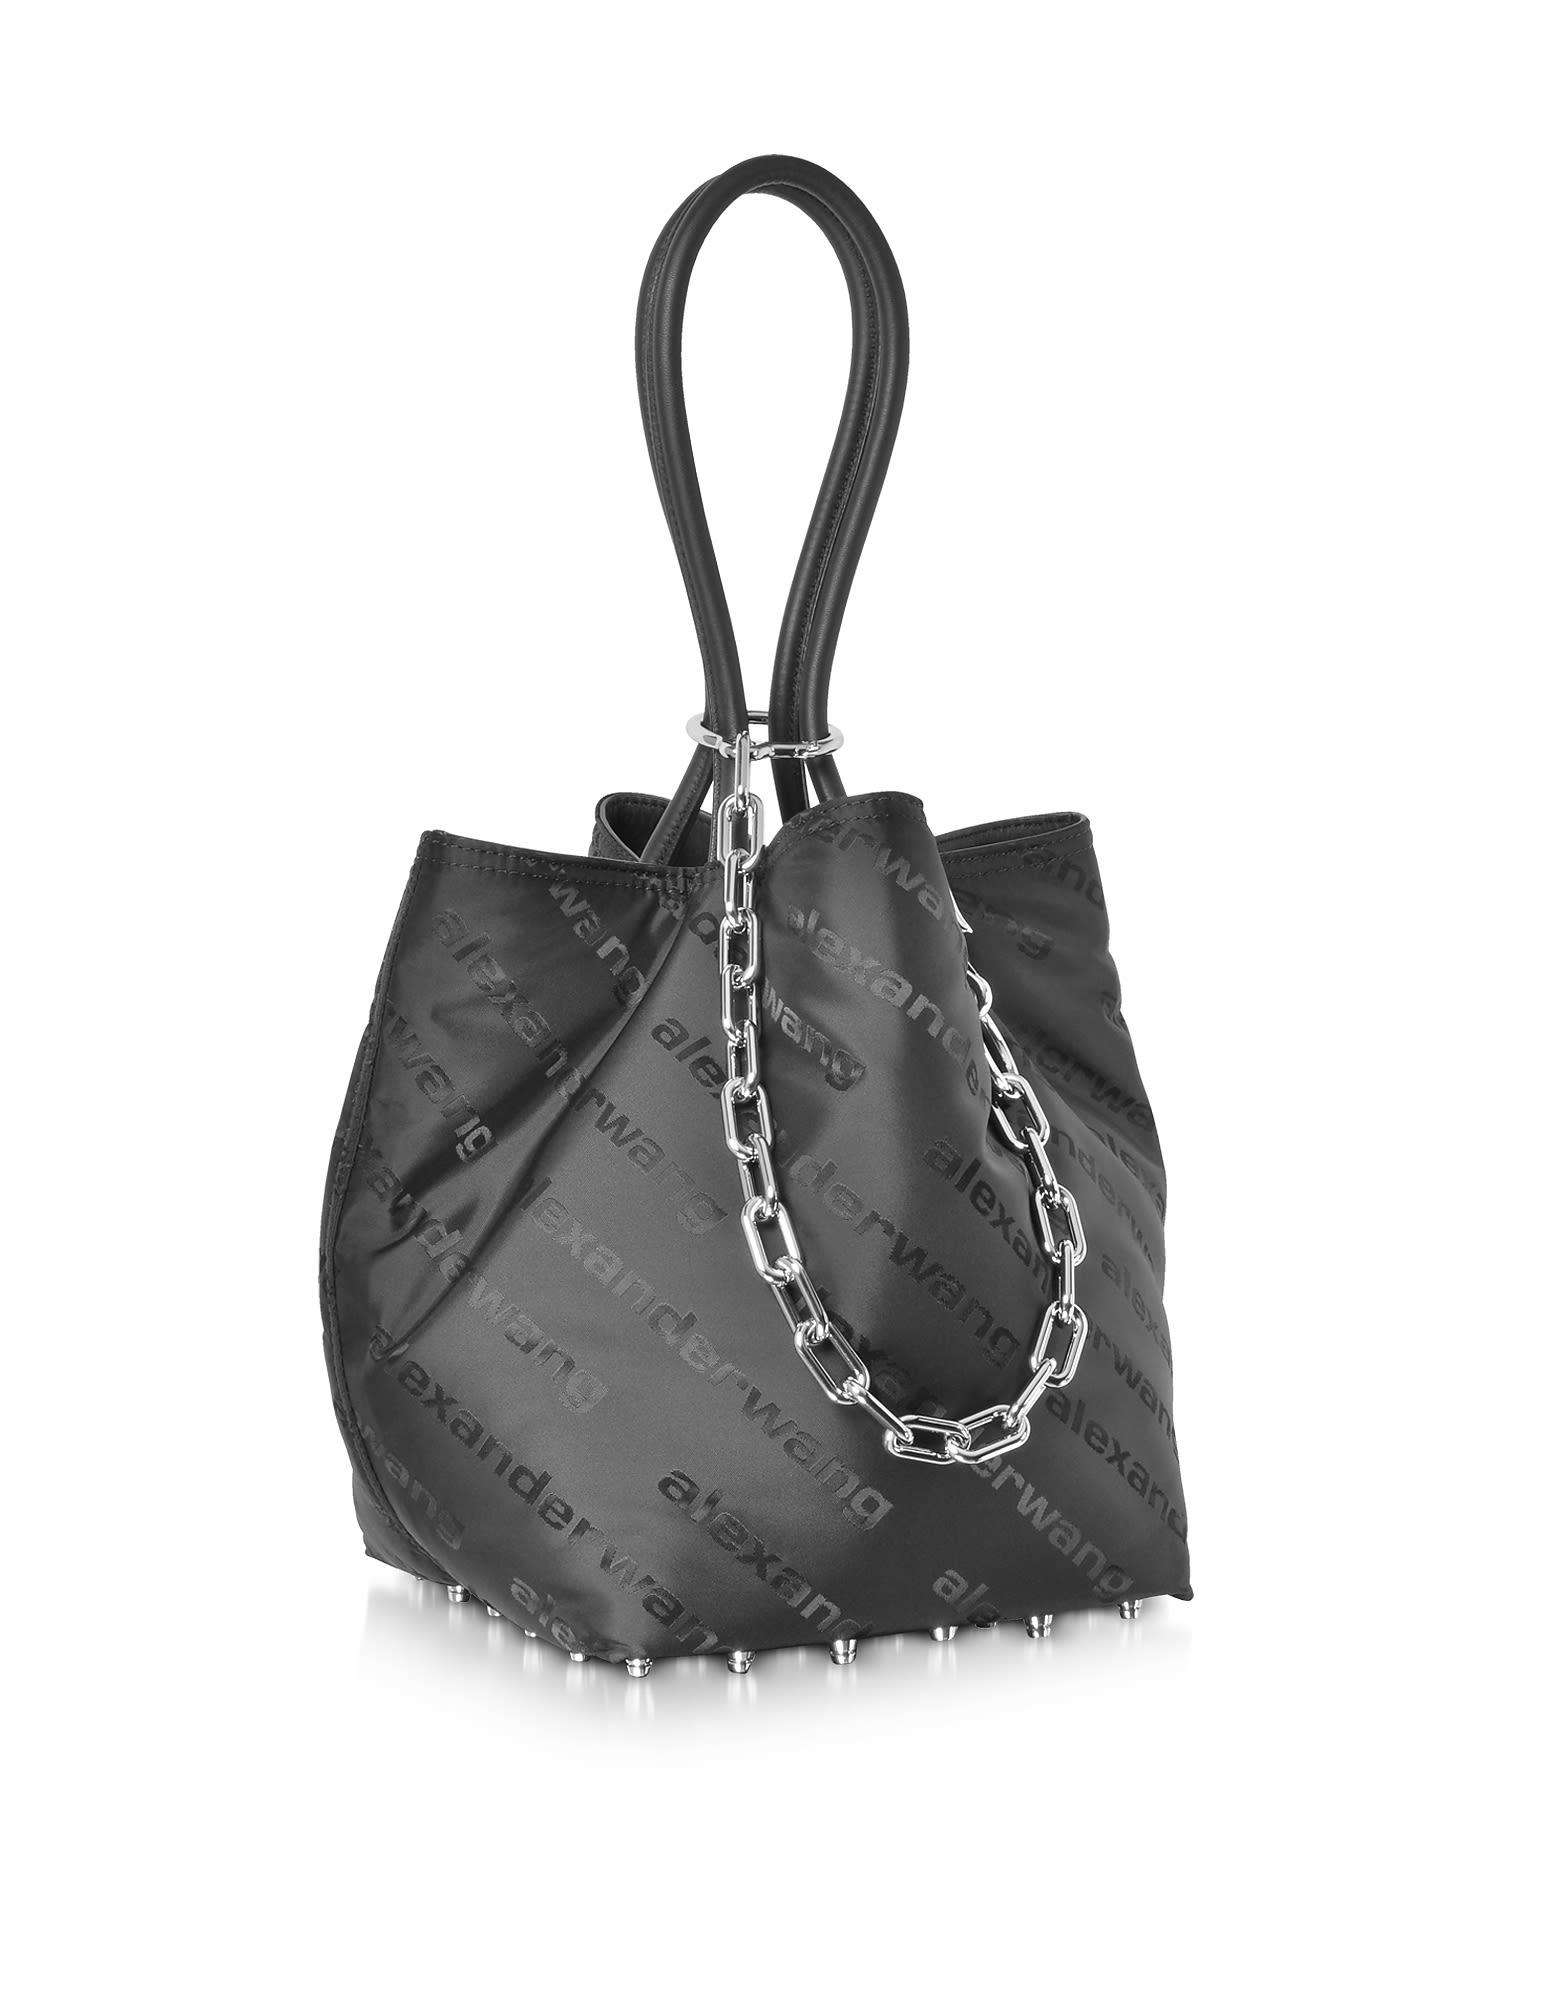 3ffe880cd6ff ... Alexander Wang Black Aw Signature Roxy Soft Small Tote Bag - Black ...